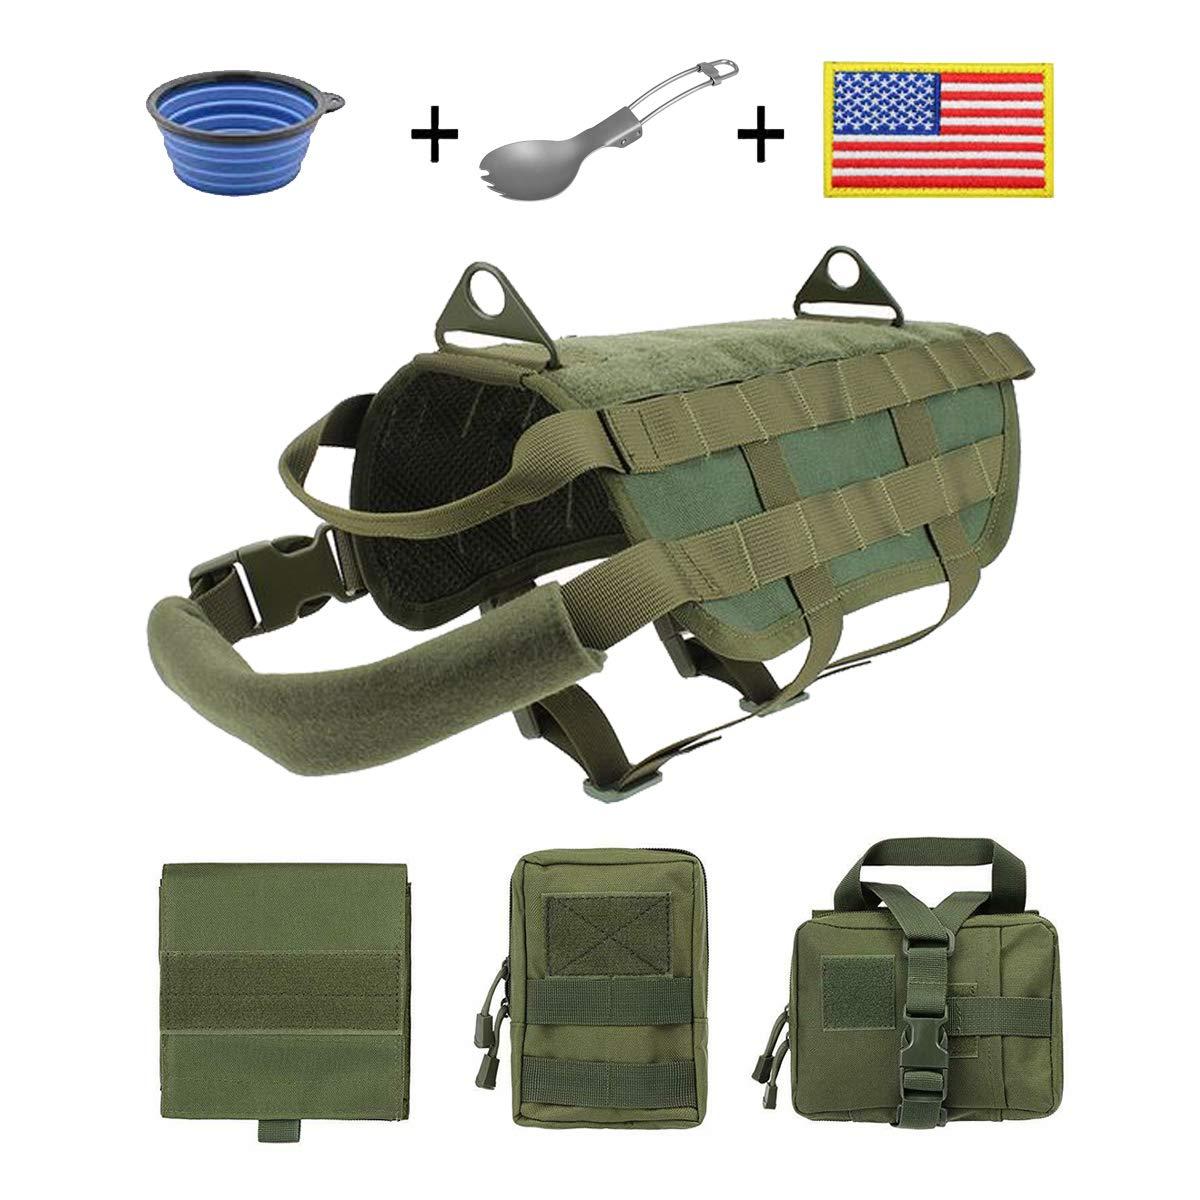 EJG Military Tactical Service Dog Training Vest Molle Dog Harness Camping Hiking Traveling Nylon Adjustable Coat with 3 Detachable Pouches for Medium /& Large Dog